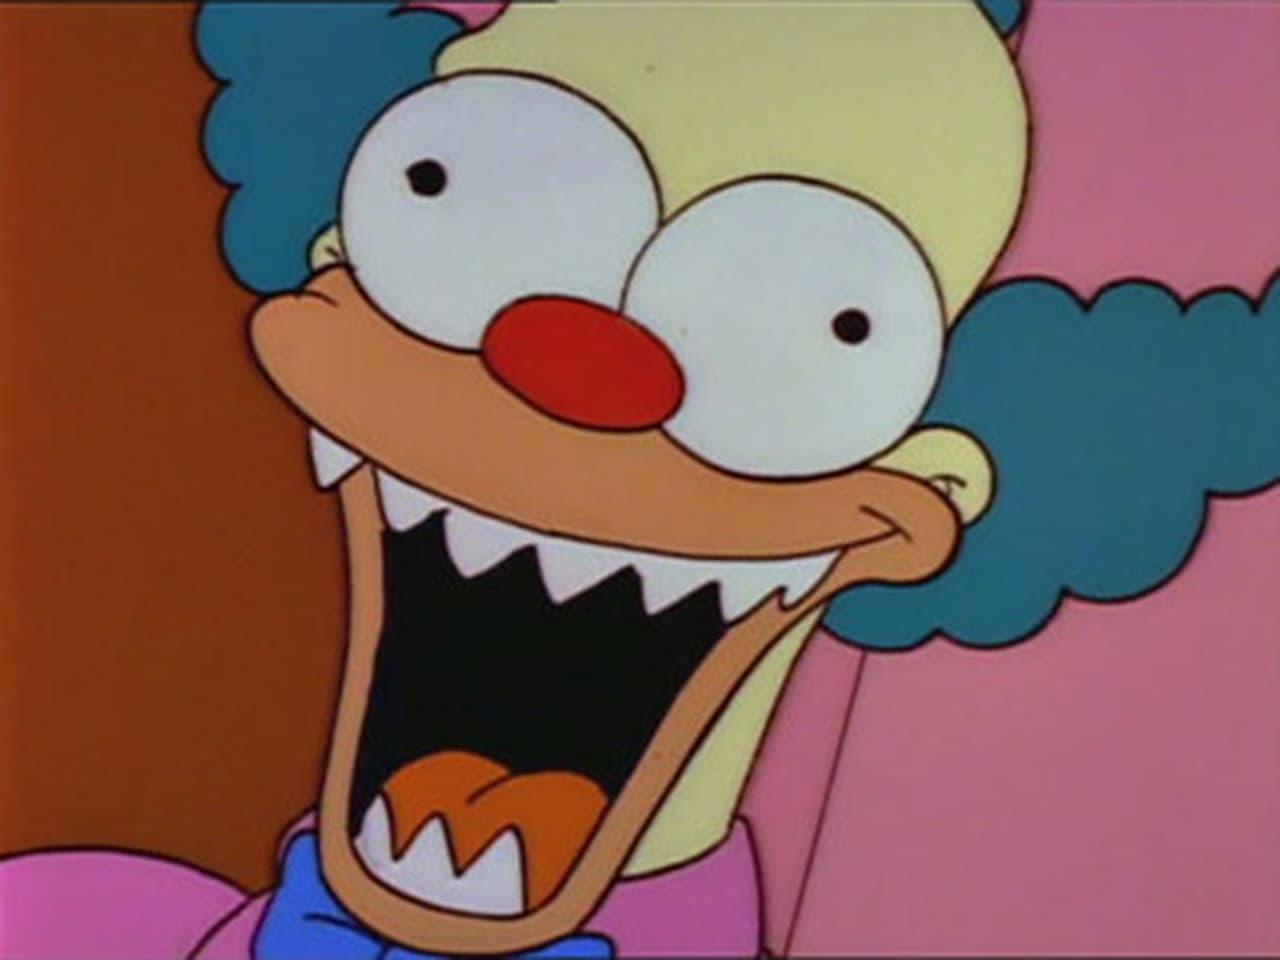 The Simpsons - Season 4 Episode 5 : Treehouse of Horror III